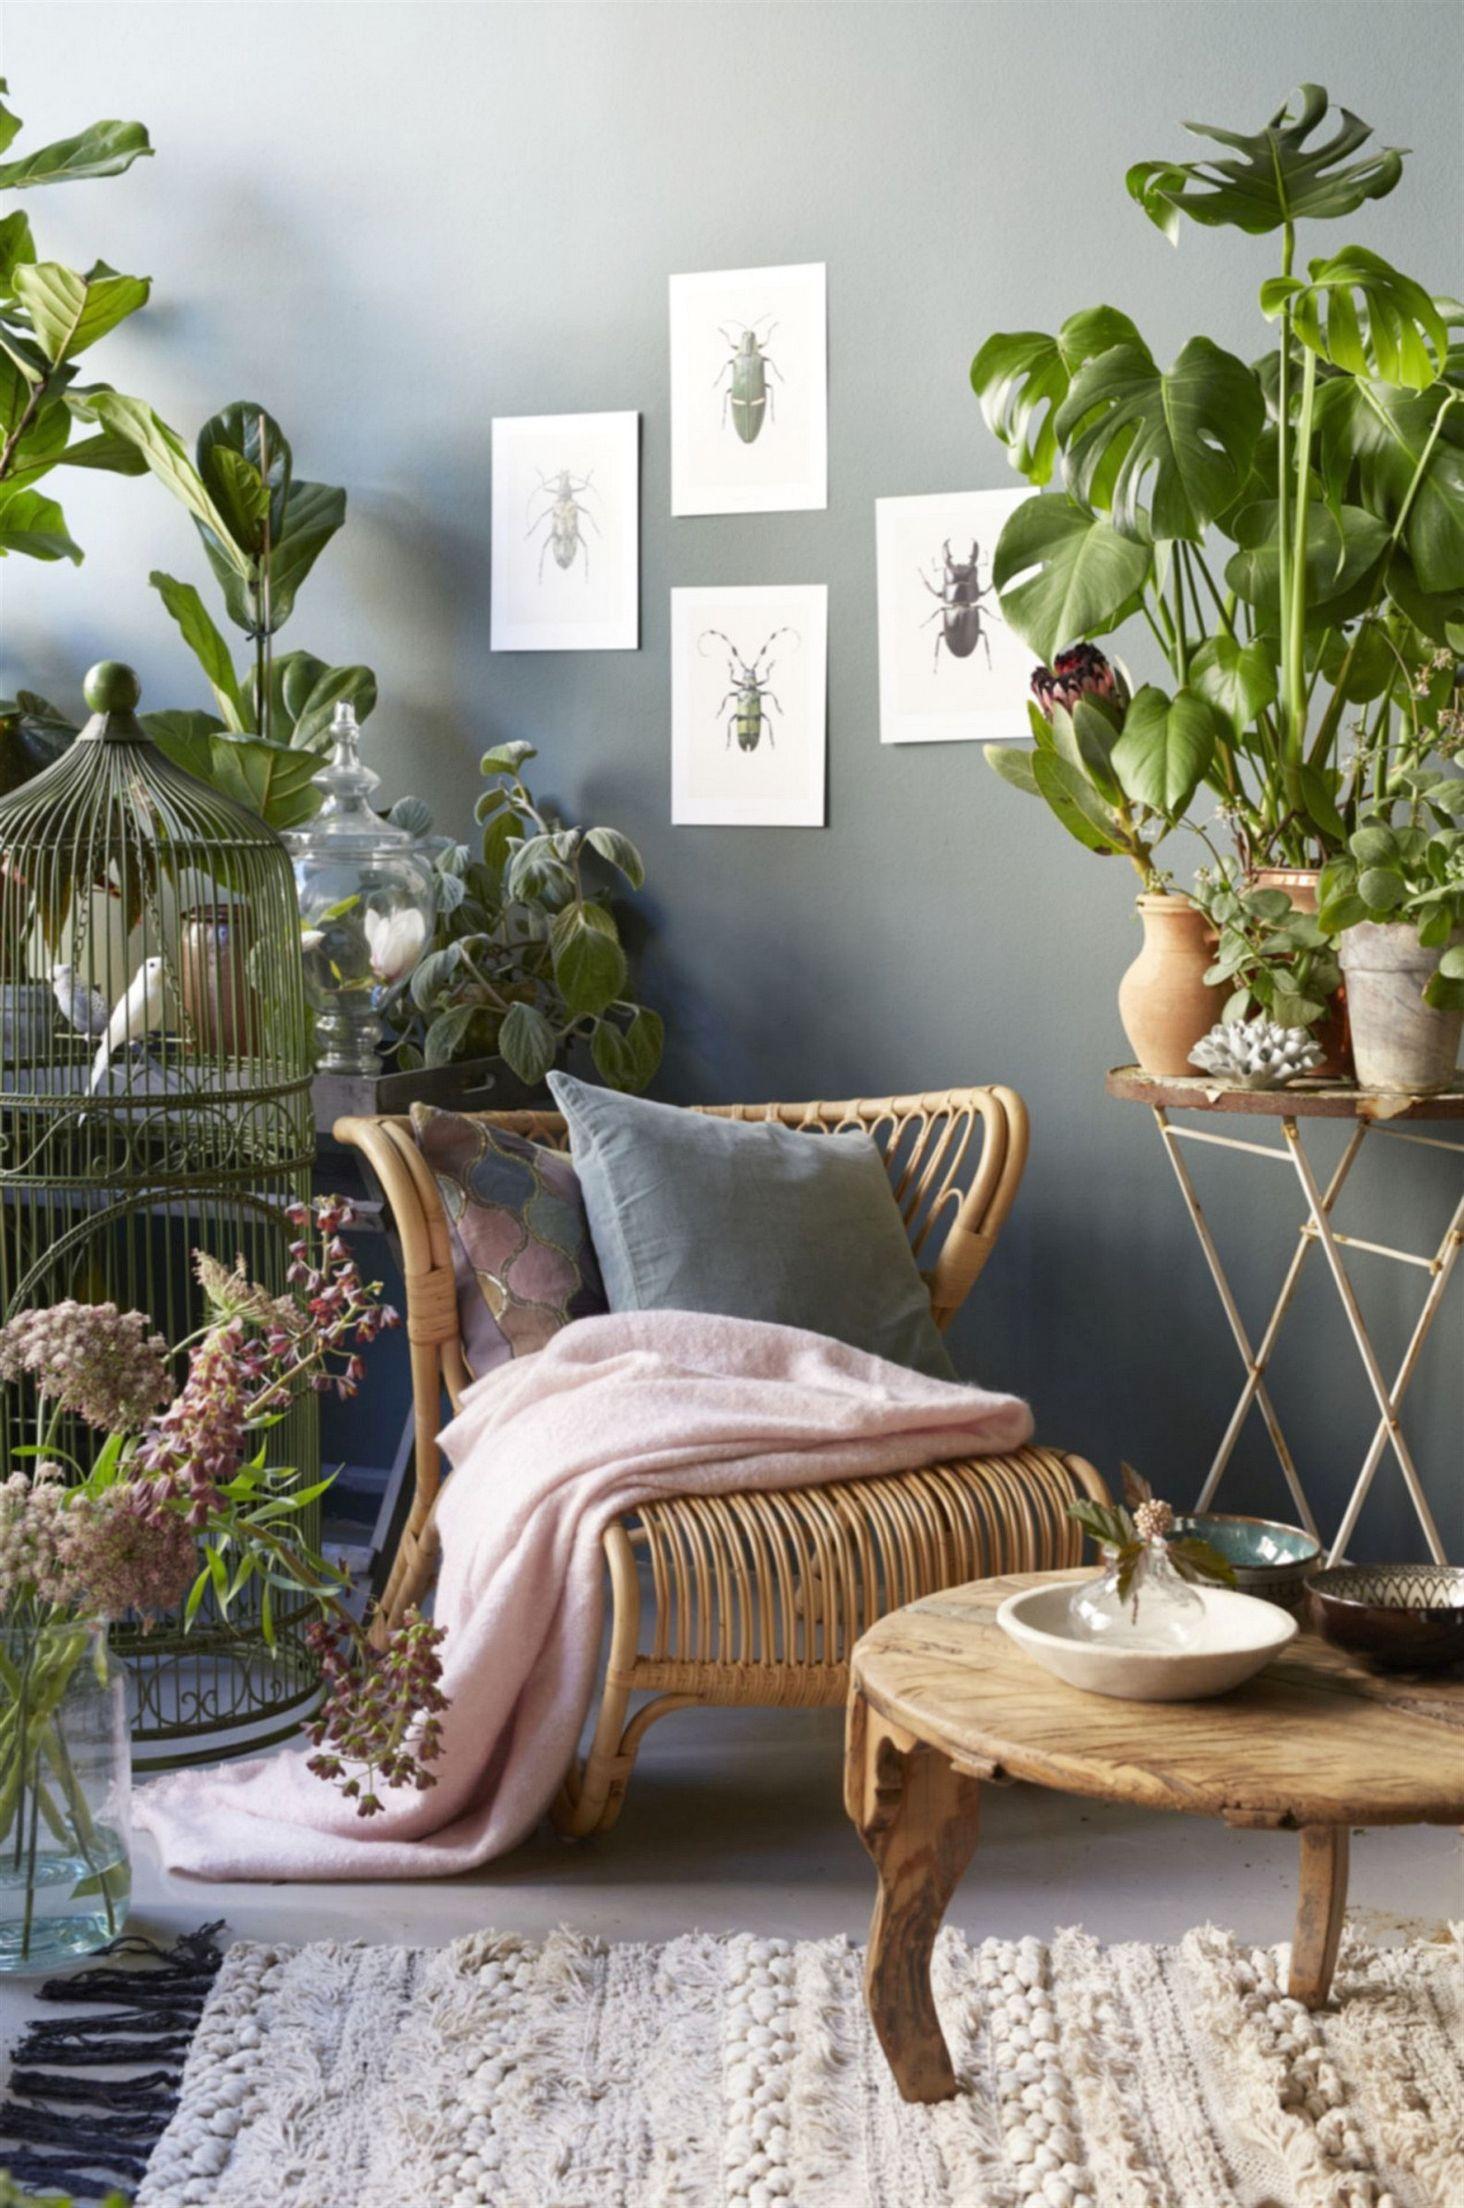 130 Gorgeous Living Room Design Ideas in